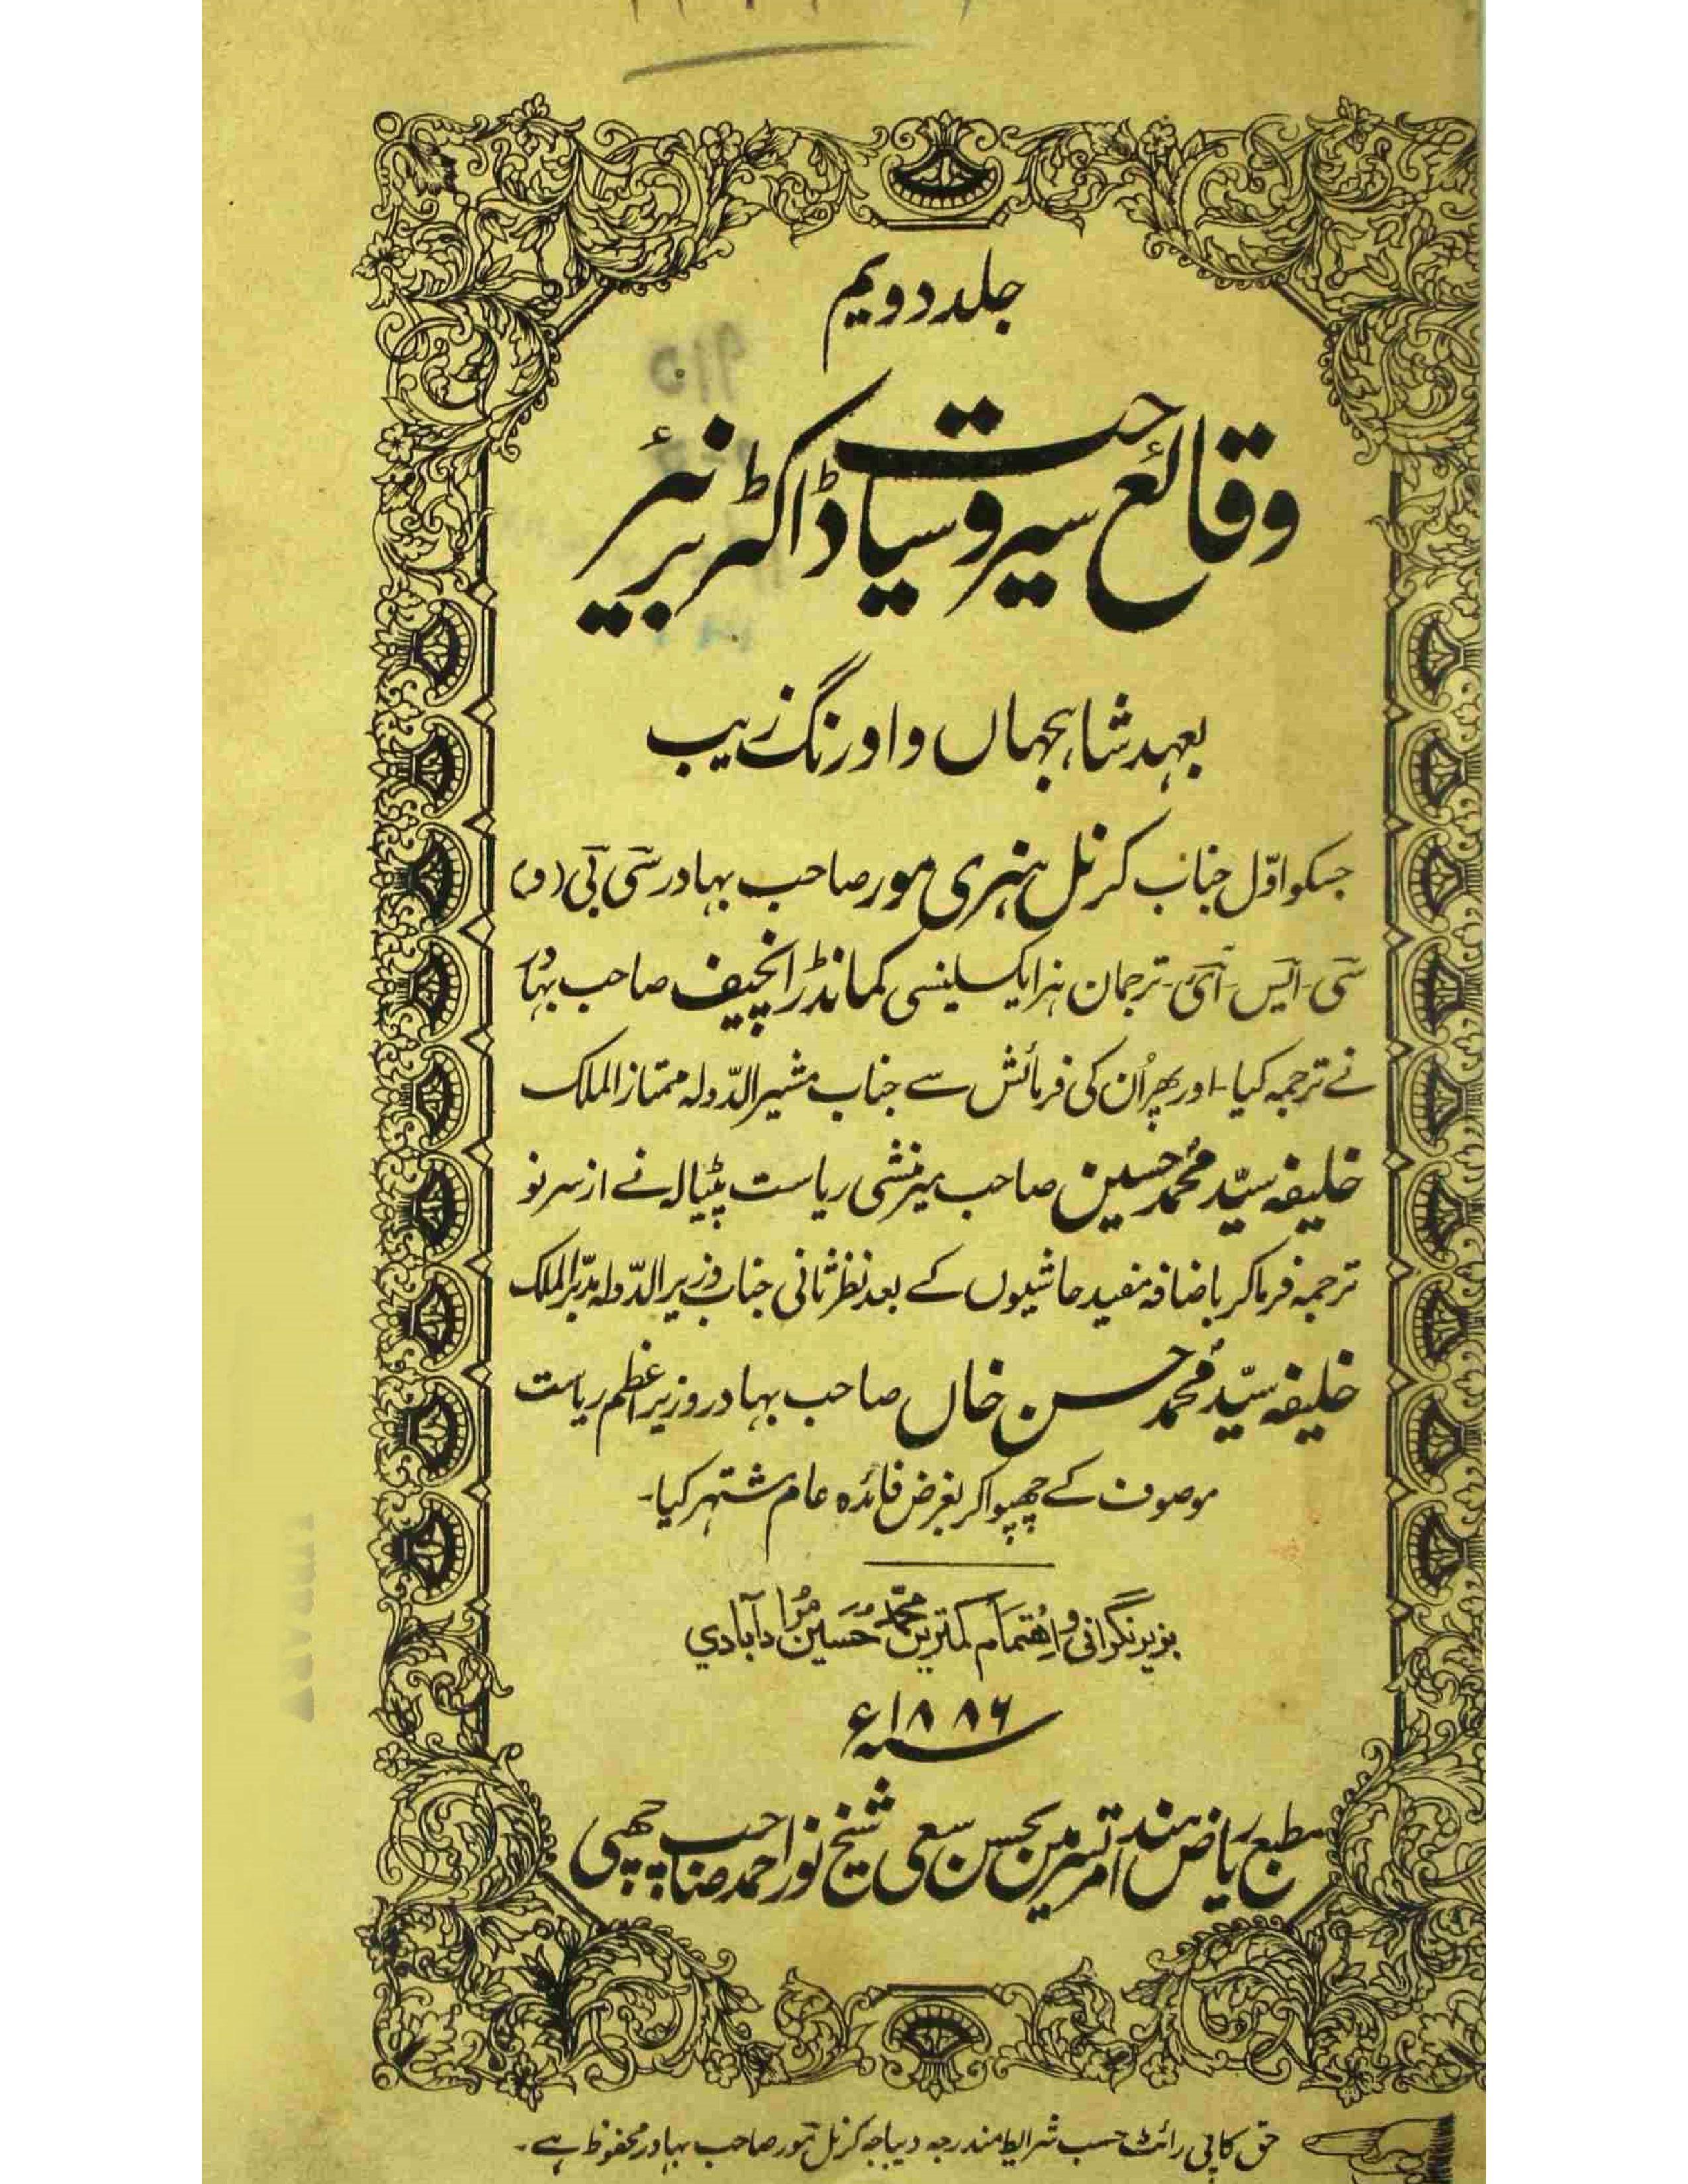 Waqae Sair-o-Siyahat Dr. Birenier     Volume-002